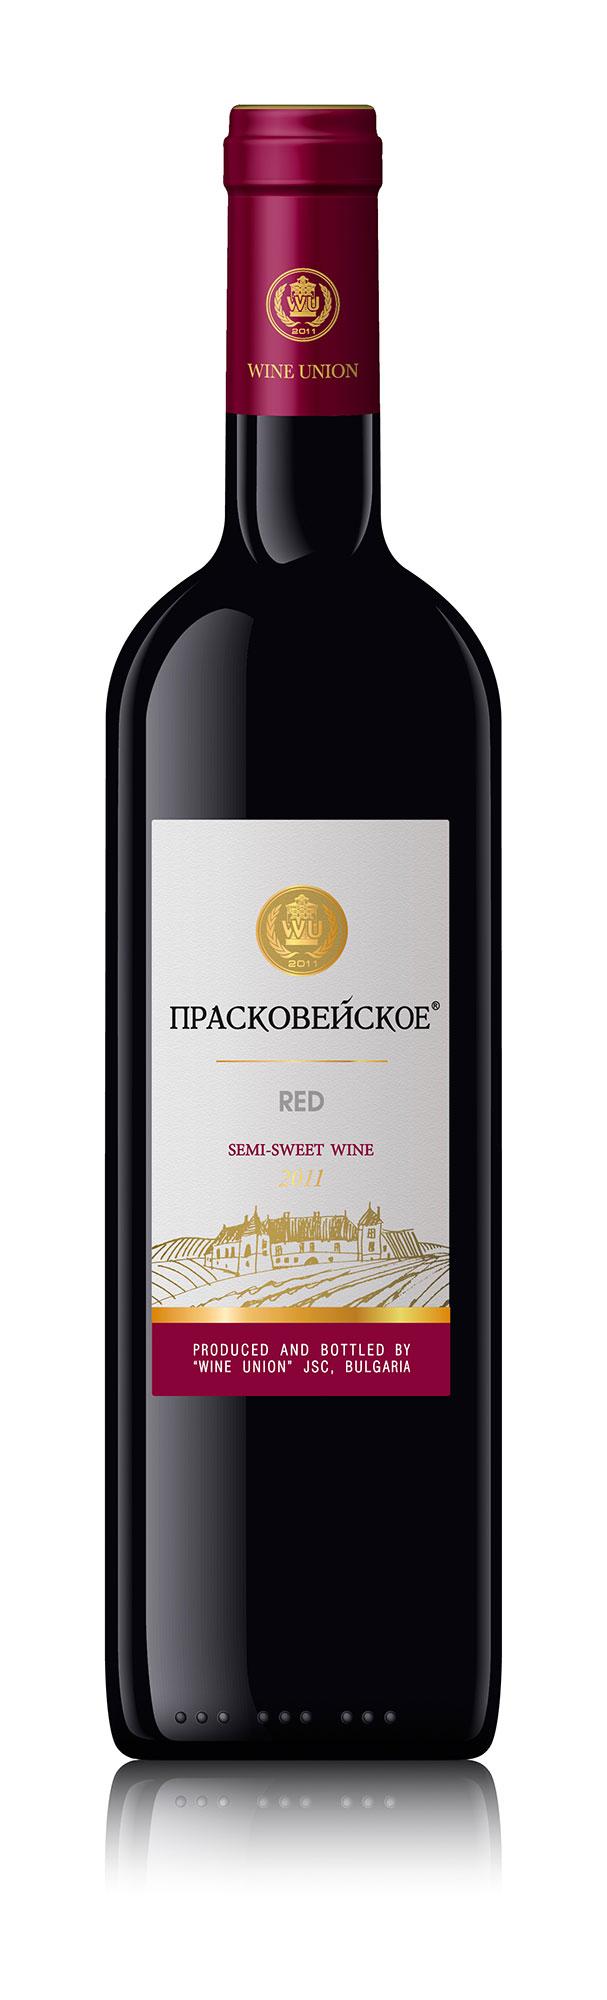 Sweet Wine 28 Images 5 Types Of Dessert Wine Wine